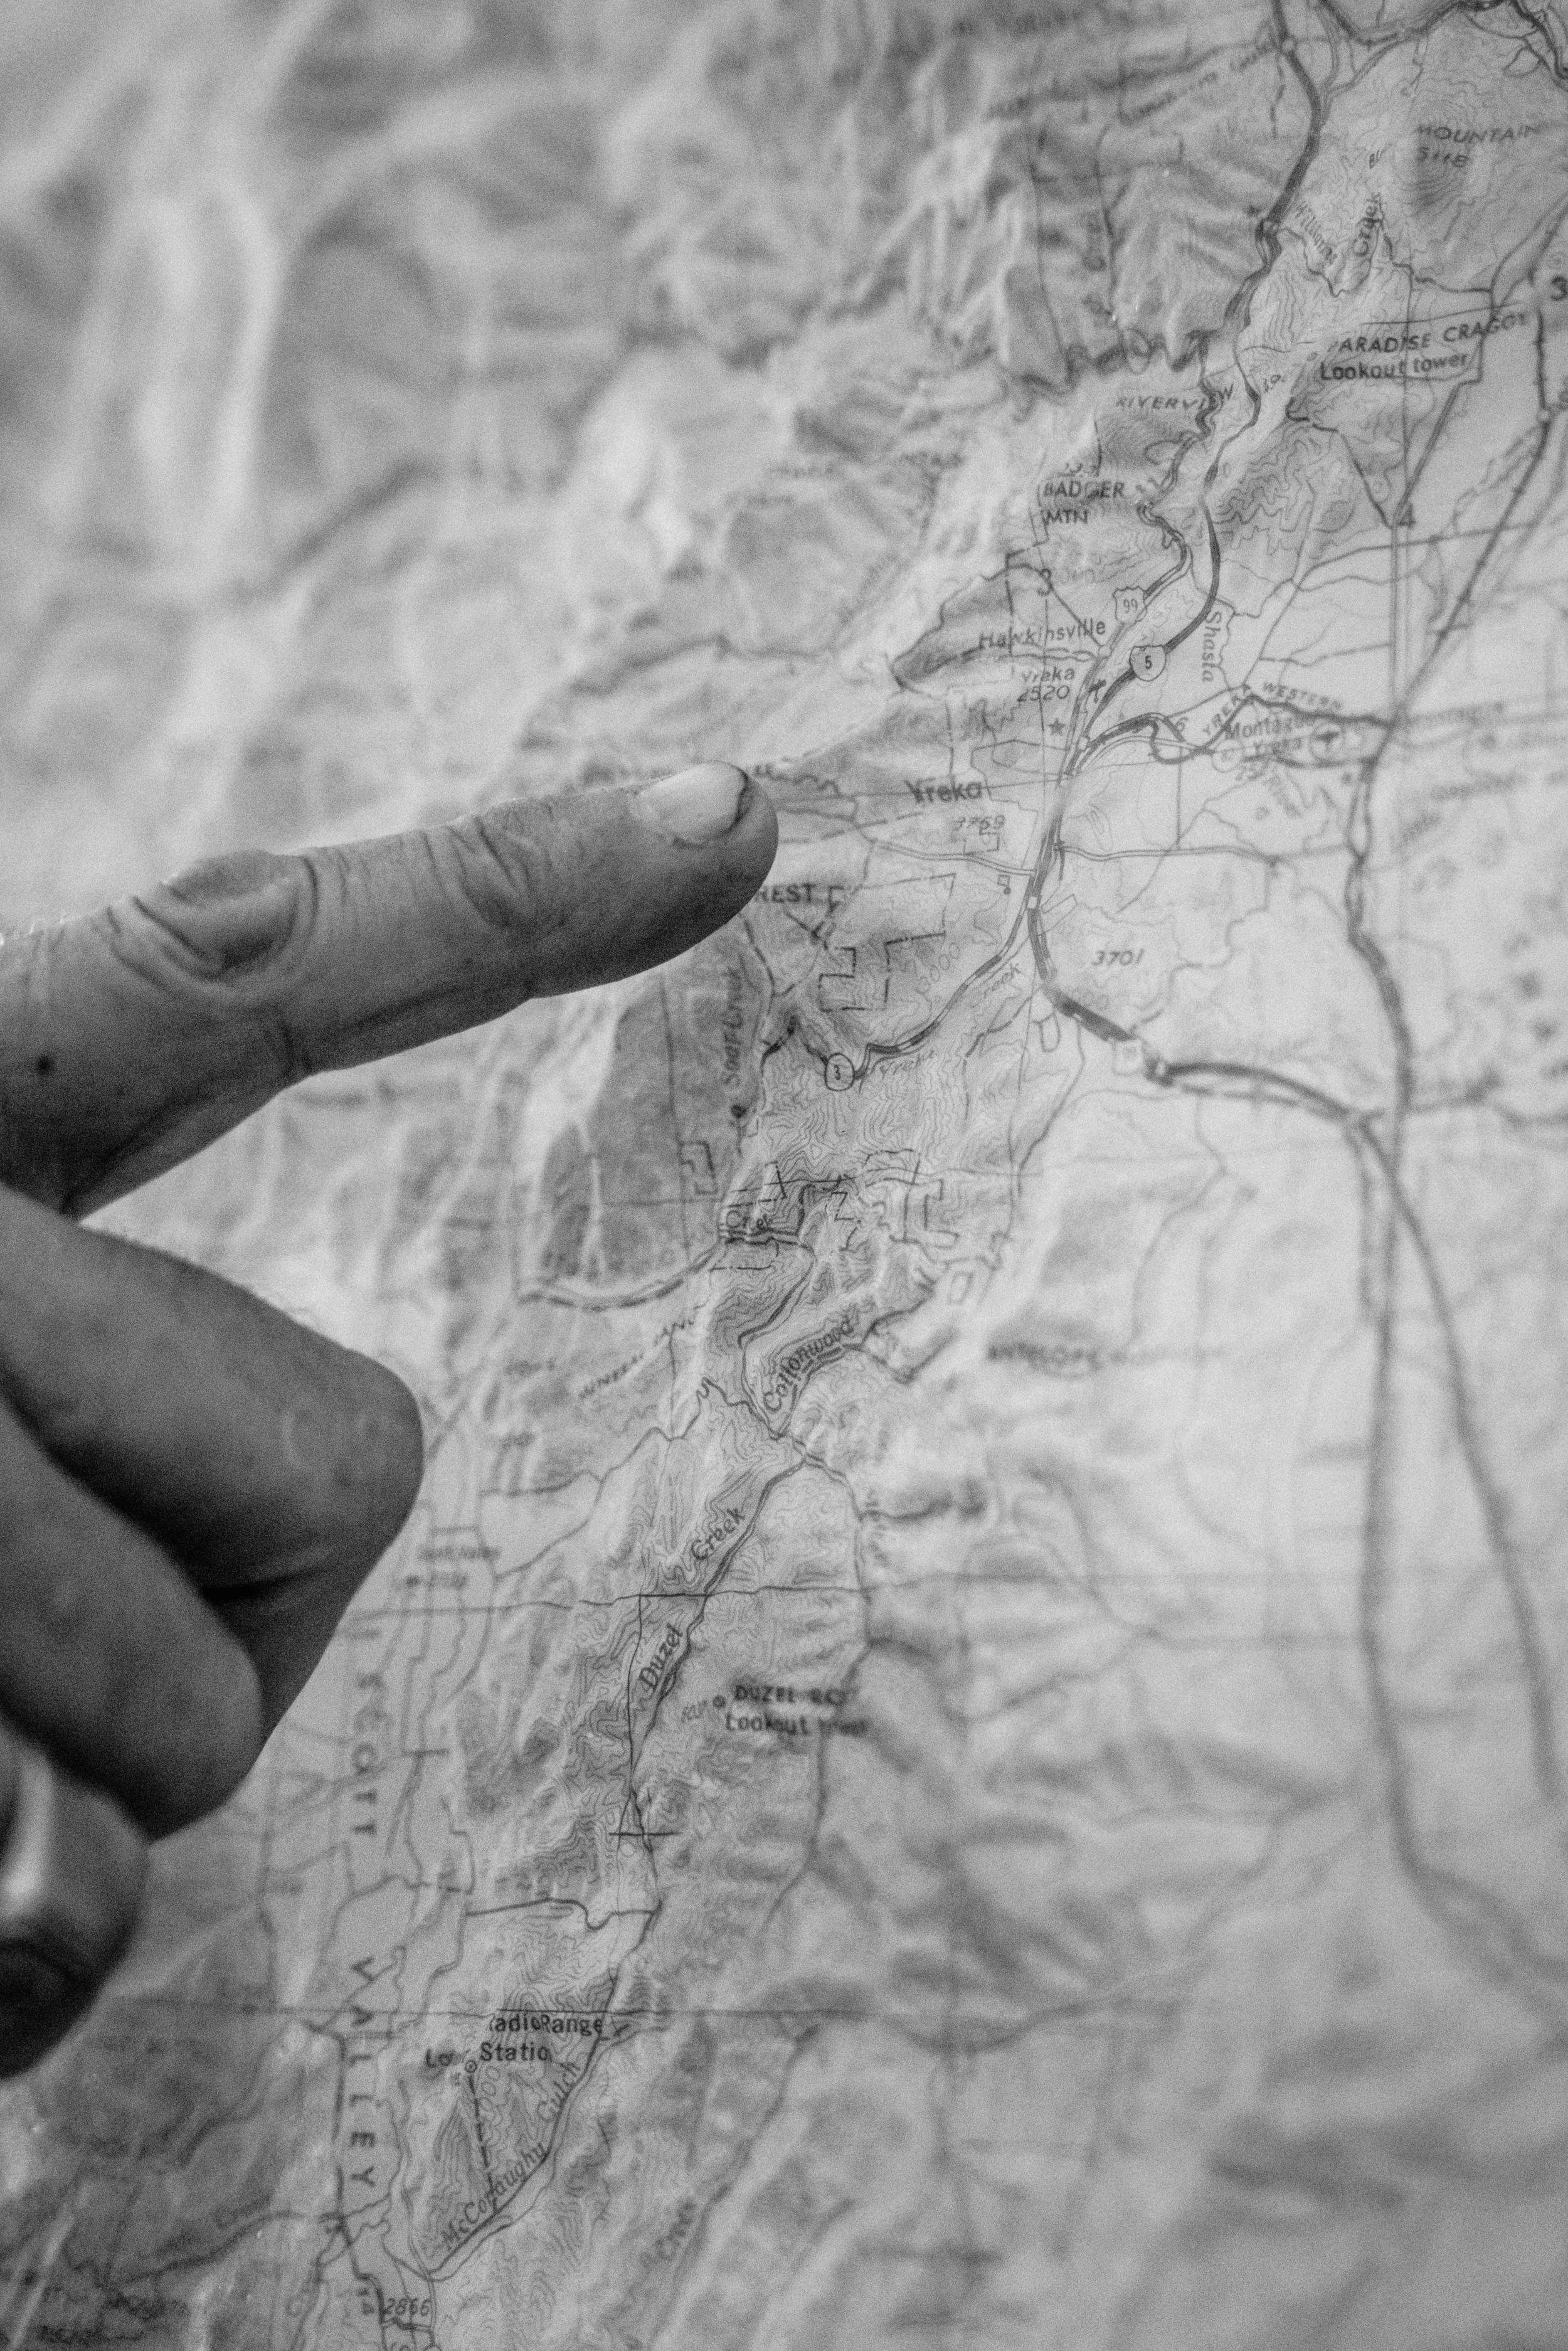 culture-crush-josue-rivas-state-of-jefferson-map.jpg